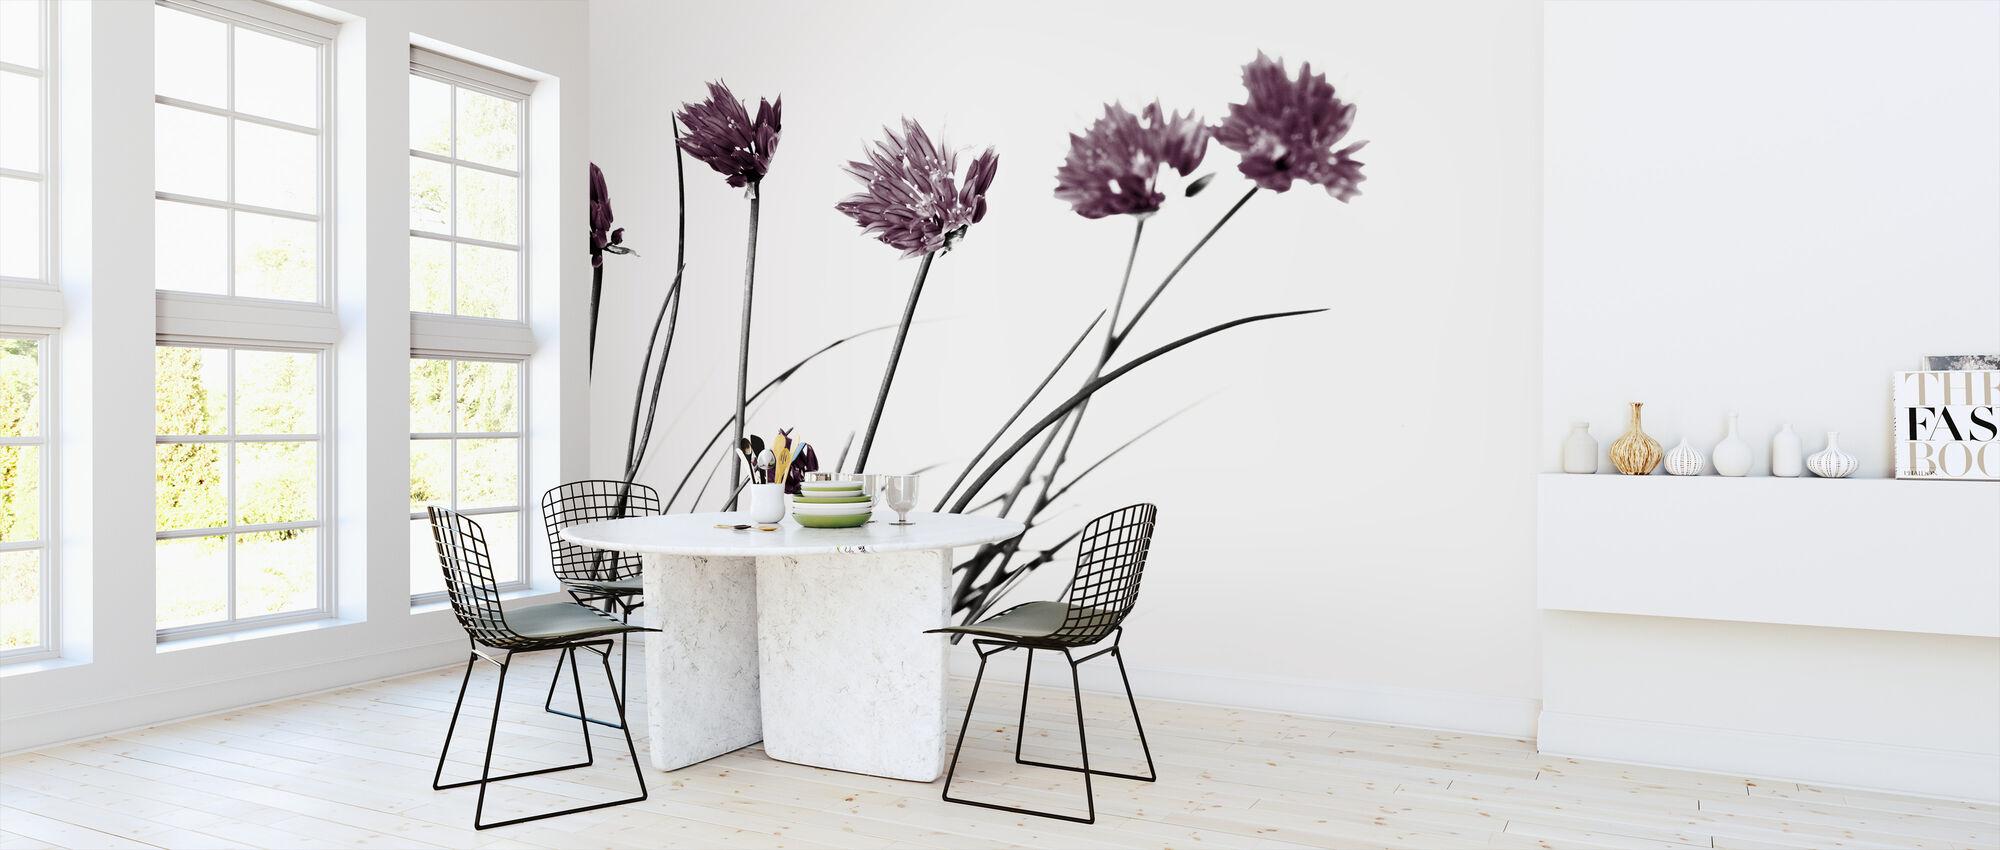 Lovely Flowers - Colorsplash - Wallpaper - Kitchen